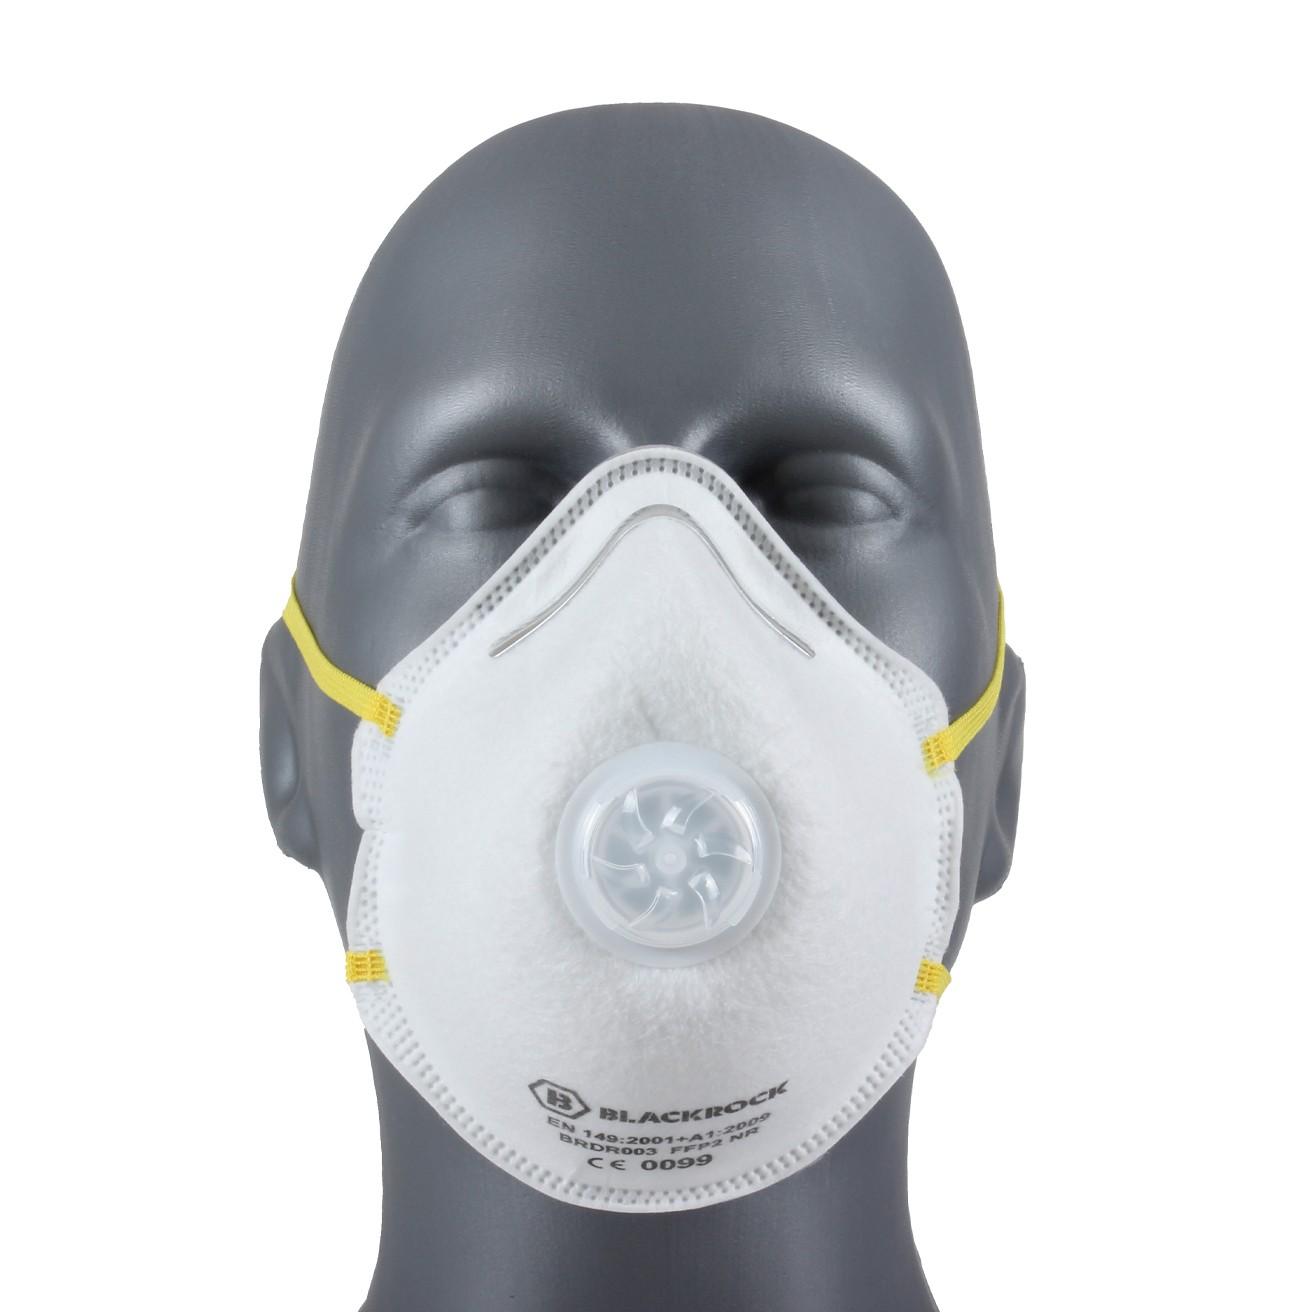 Eazi-Breathe FFP2 Moulded Disposable Respirator